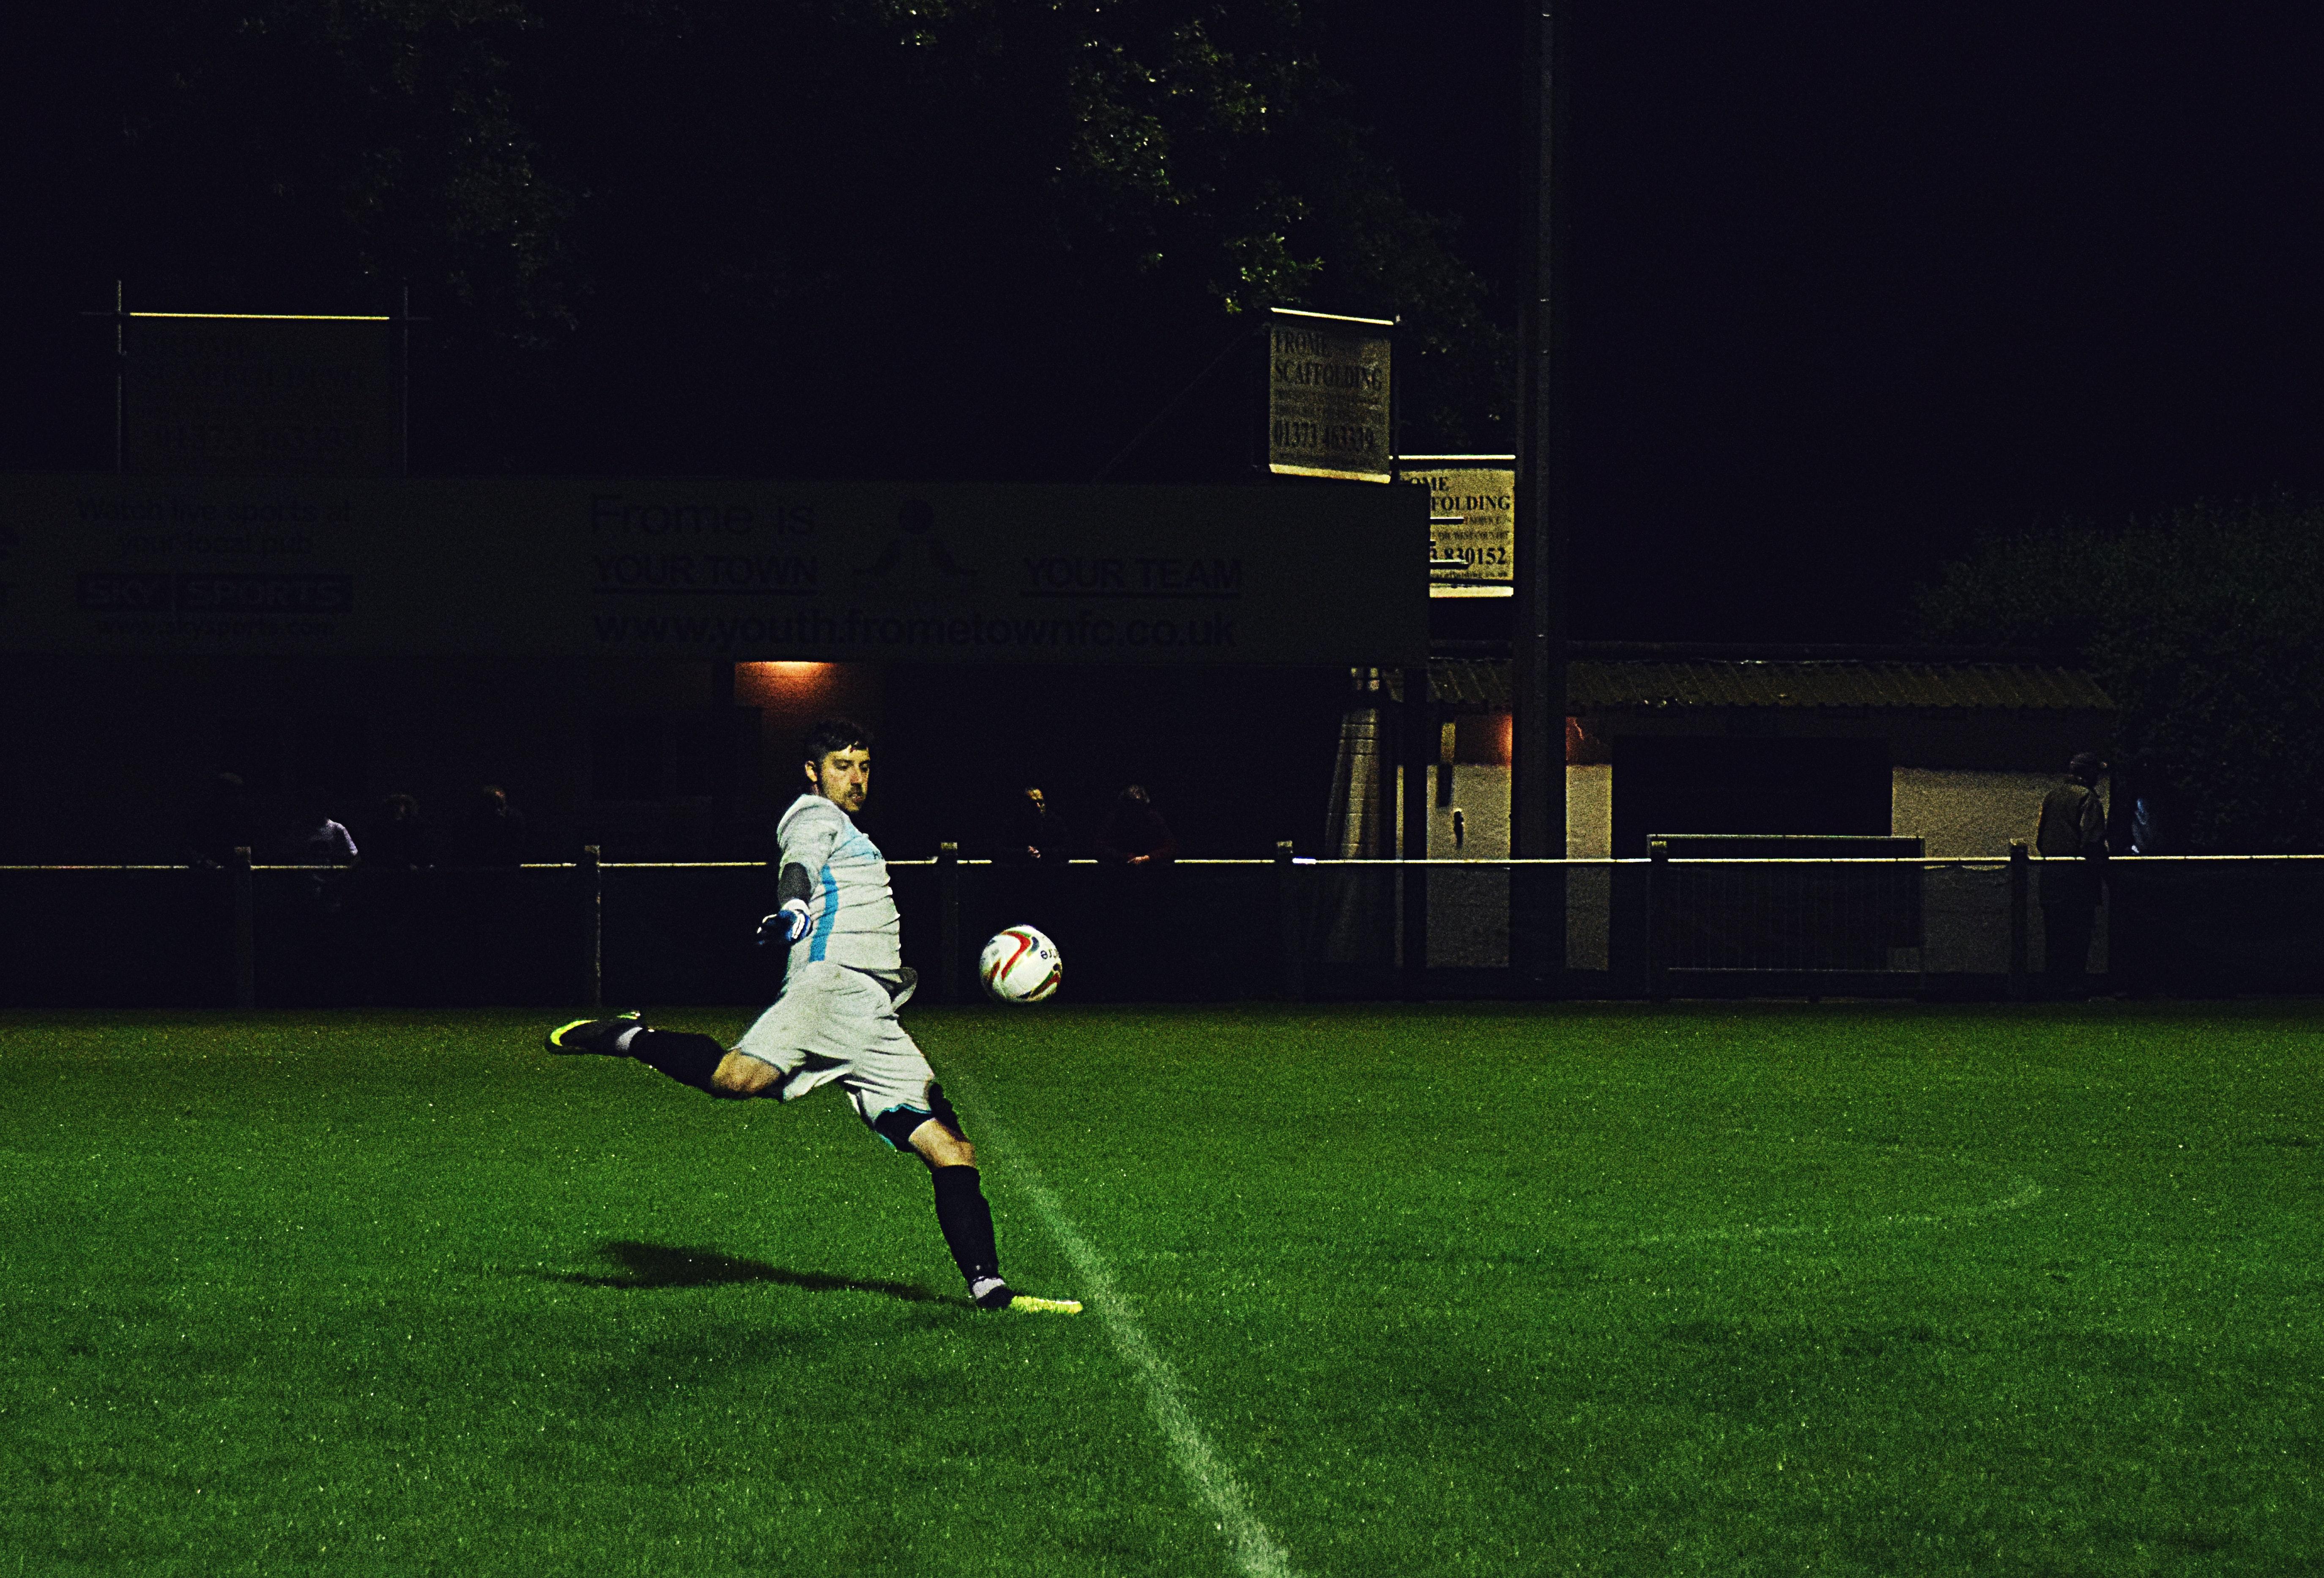 Person Kicks Soccer Ball in Field, Action, Play, Wear, Uniform, HQ Photo